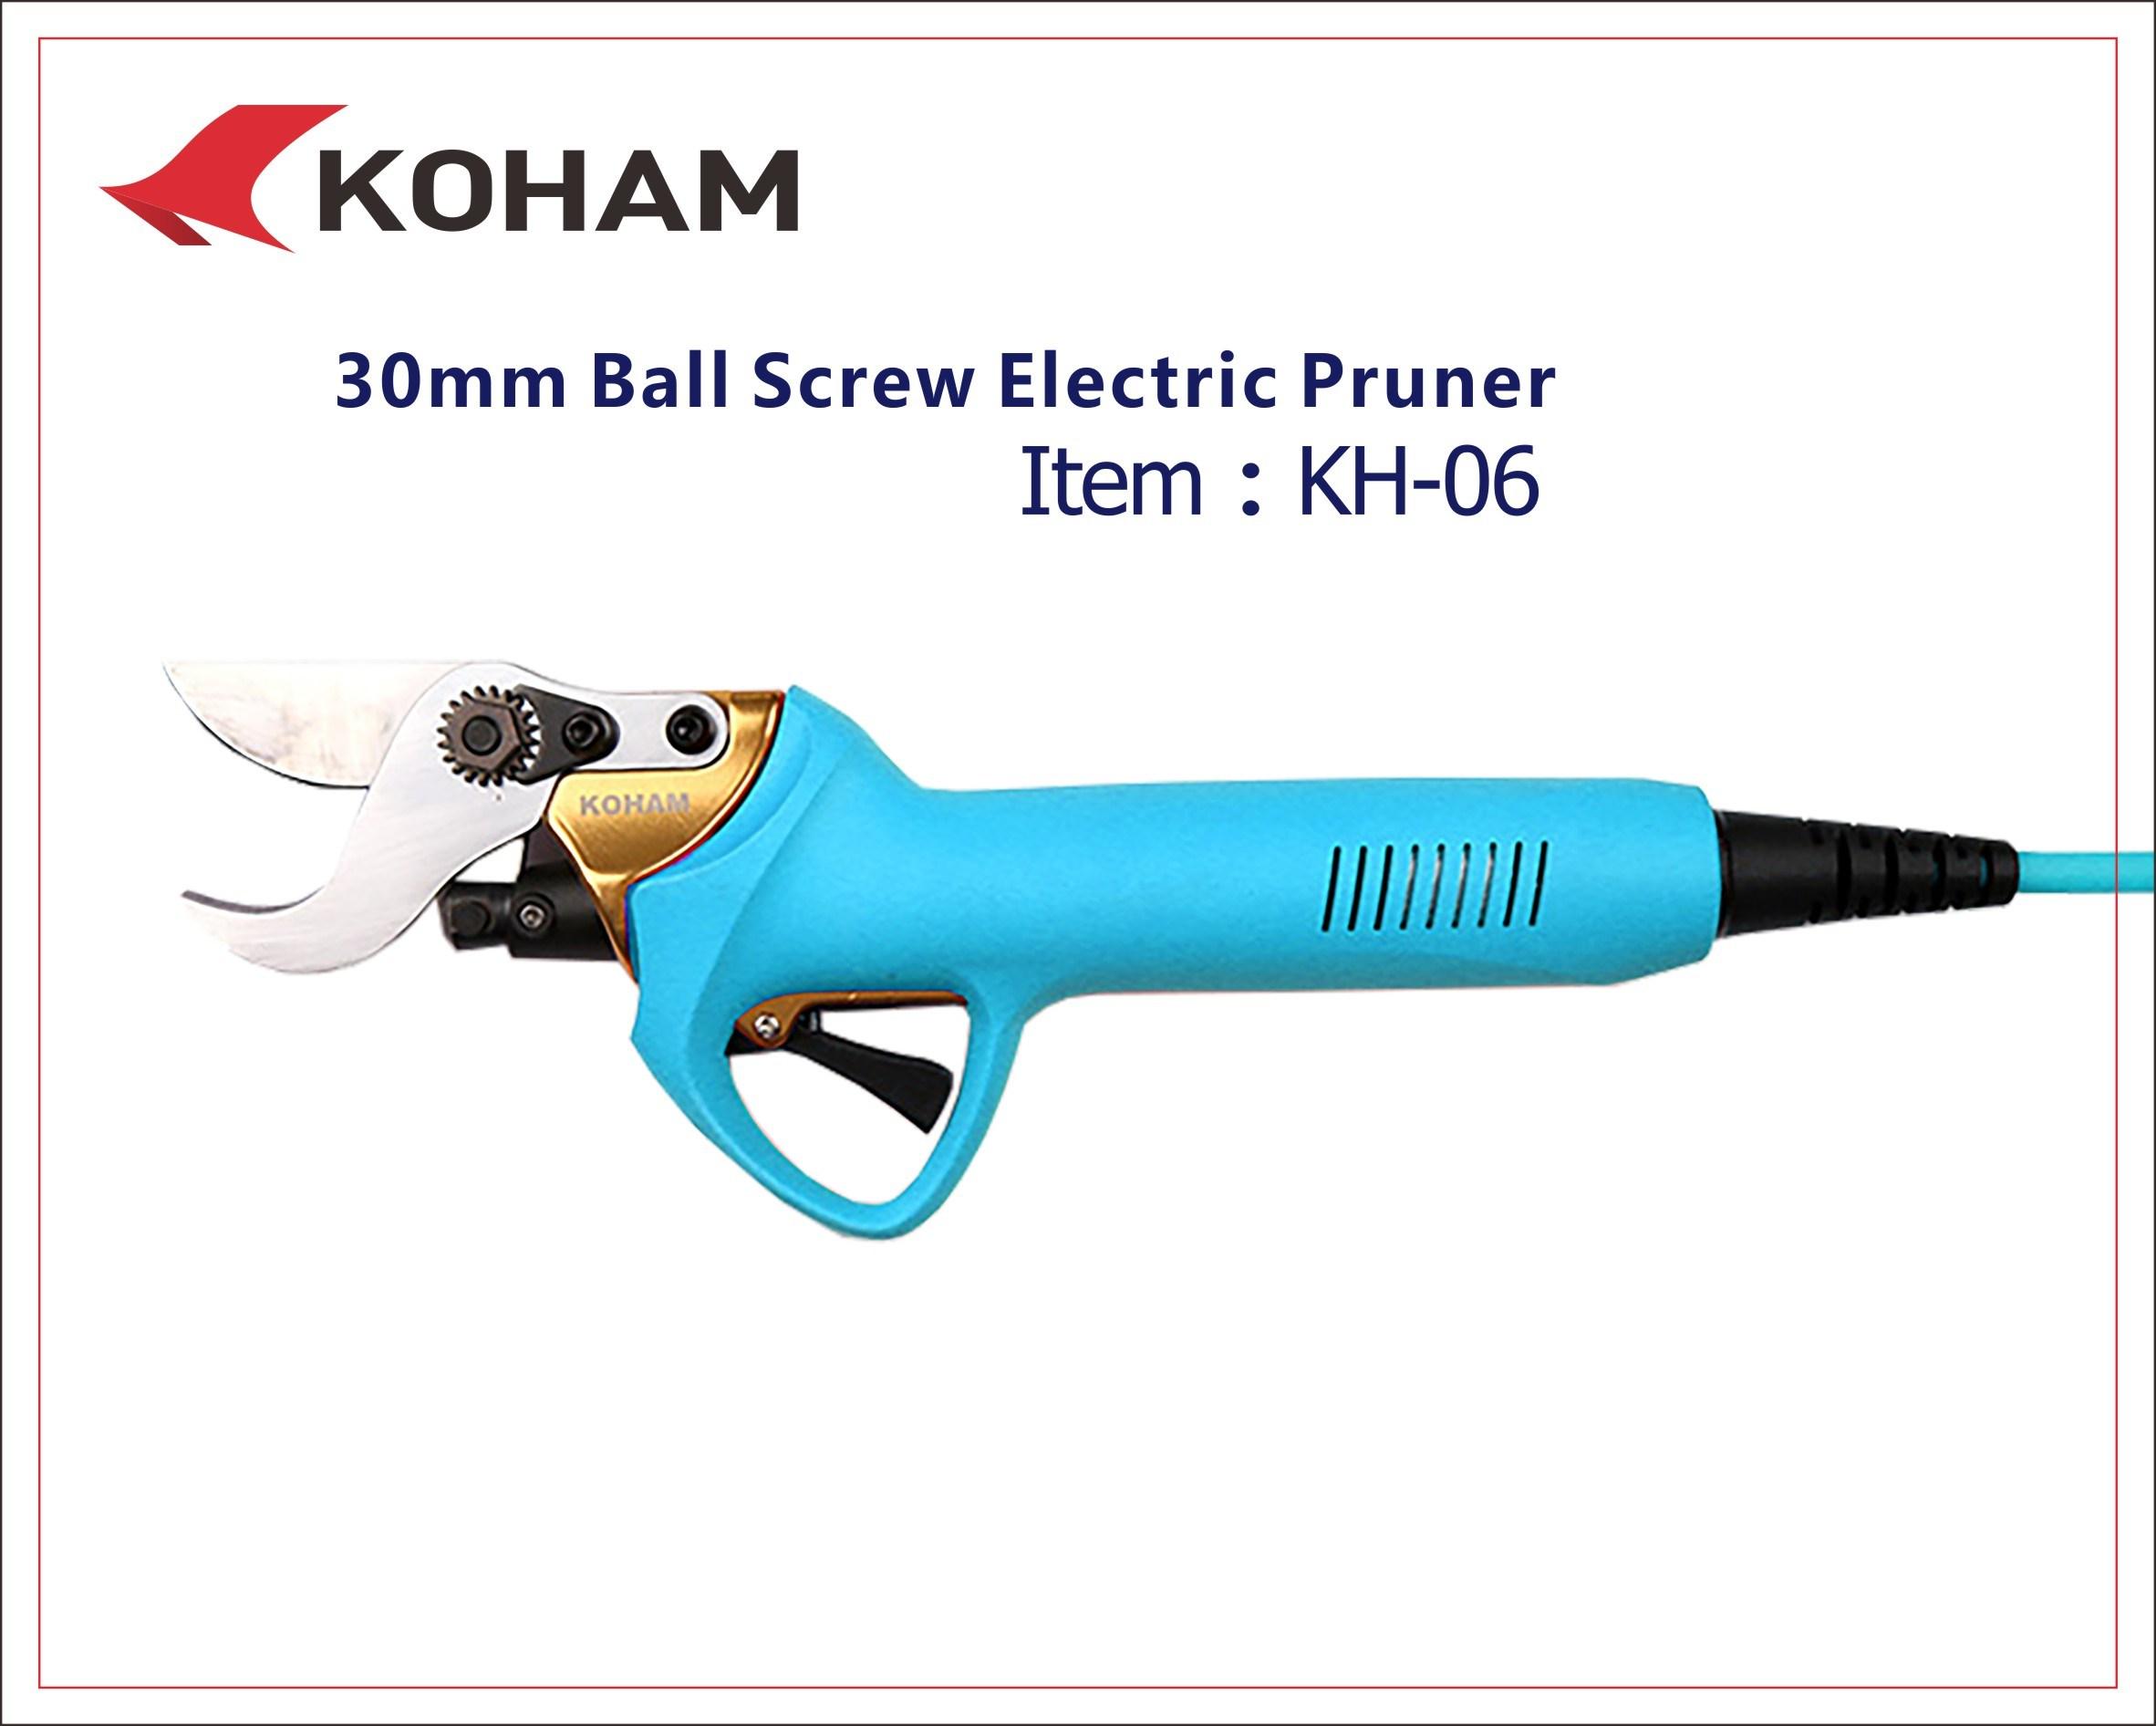 Koham 30mm Ball Screw Electric Pruner